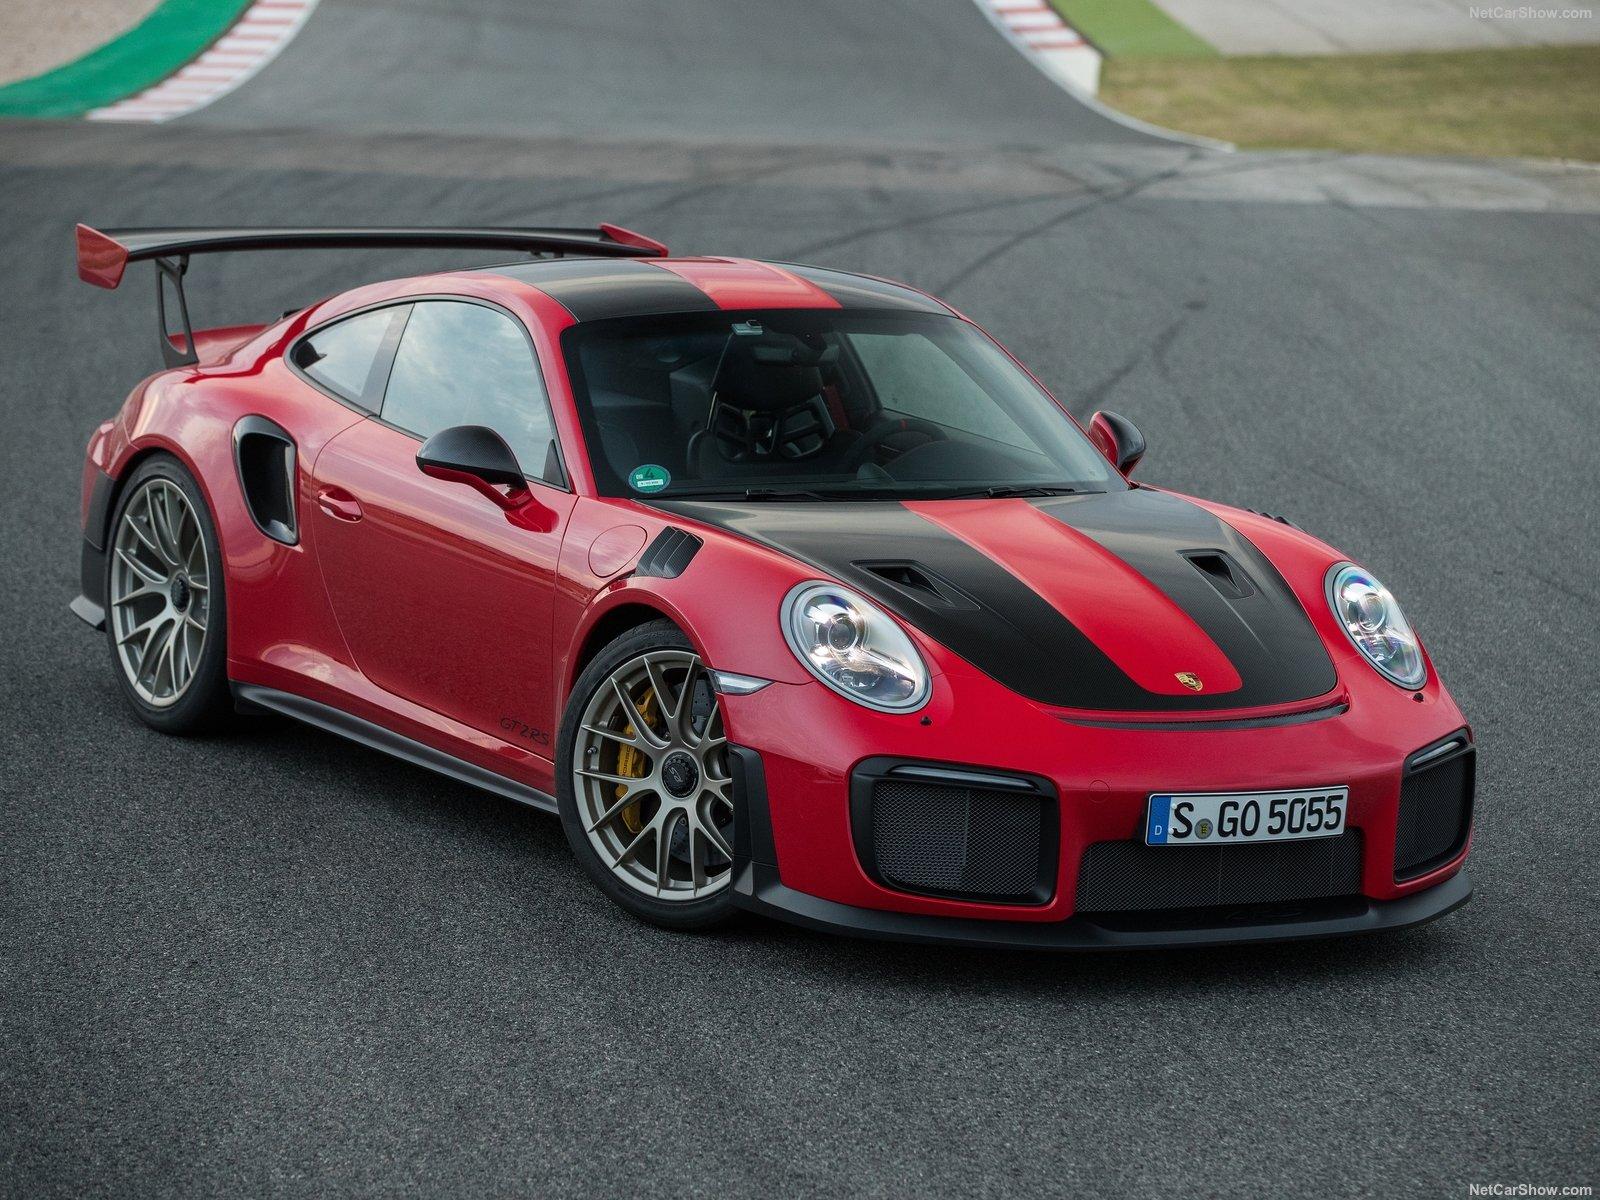 Porsche 911 Gt2 Rs Picture 183233 Porsche Photo Gallery Carsbase Com